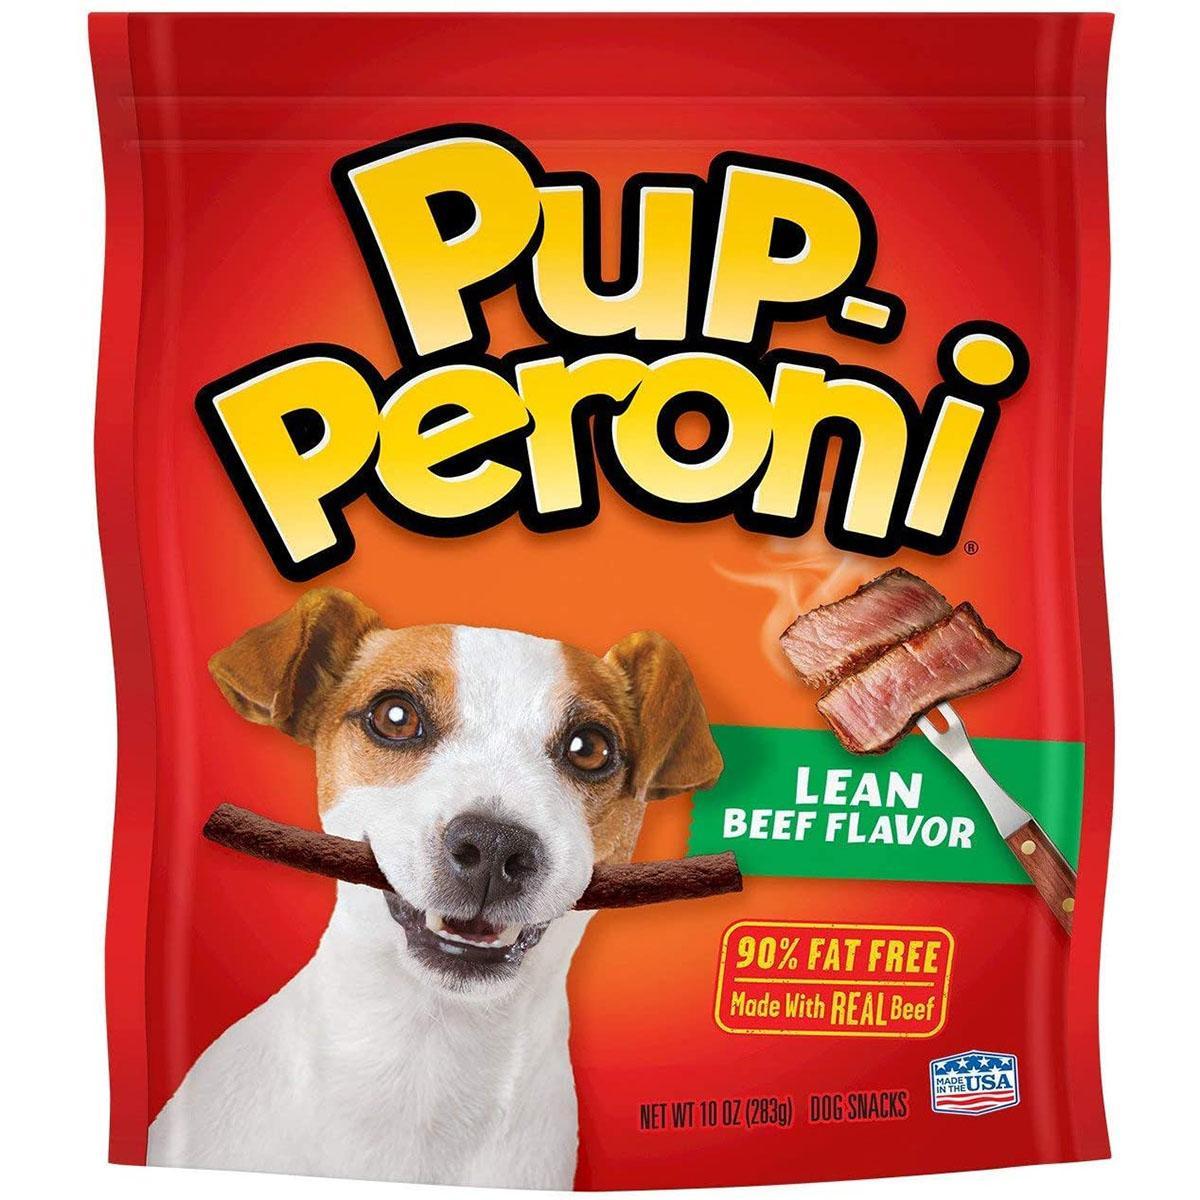 Pup-Peroni Lean Beef Flavor Dog Treats